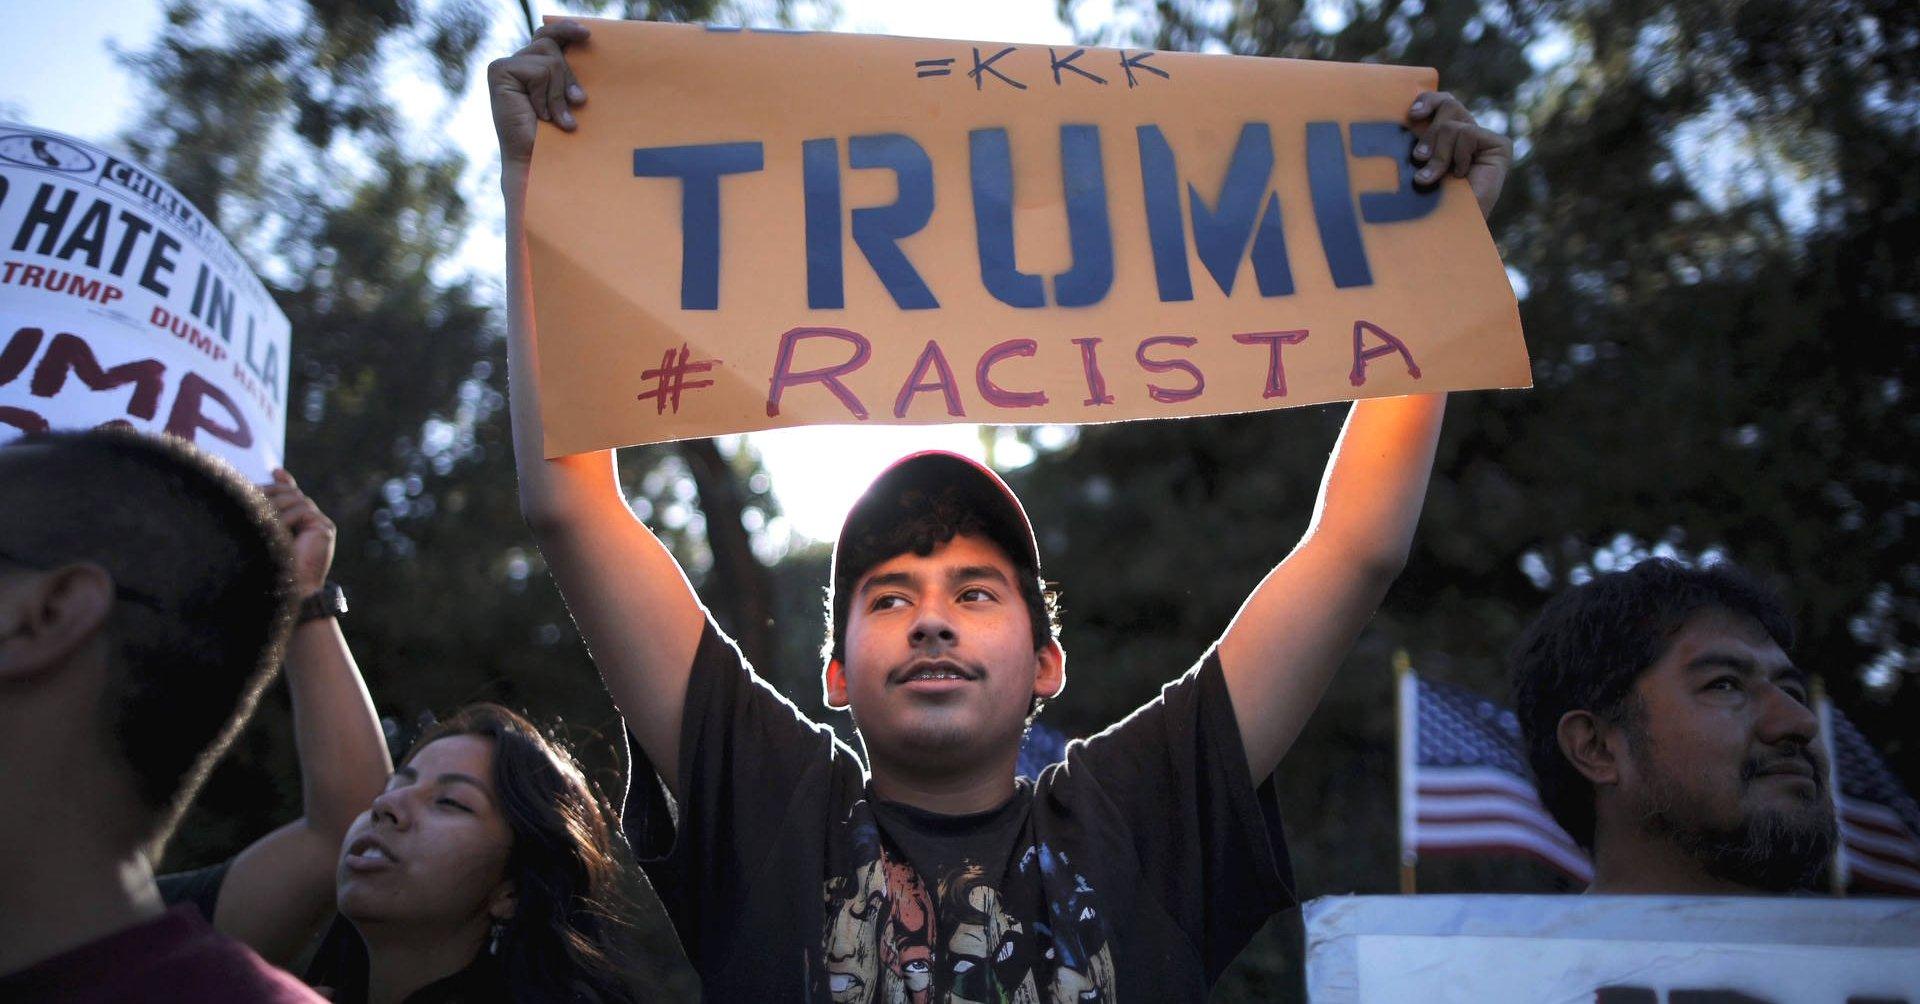 Trump Racista - Fuente foto web - Valeria Agustina Rodriguez - Data Urgente